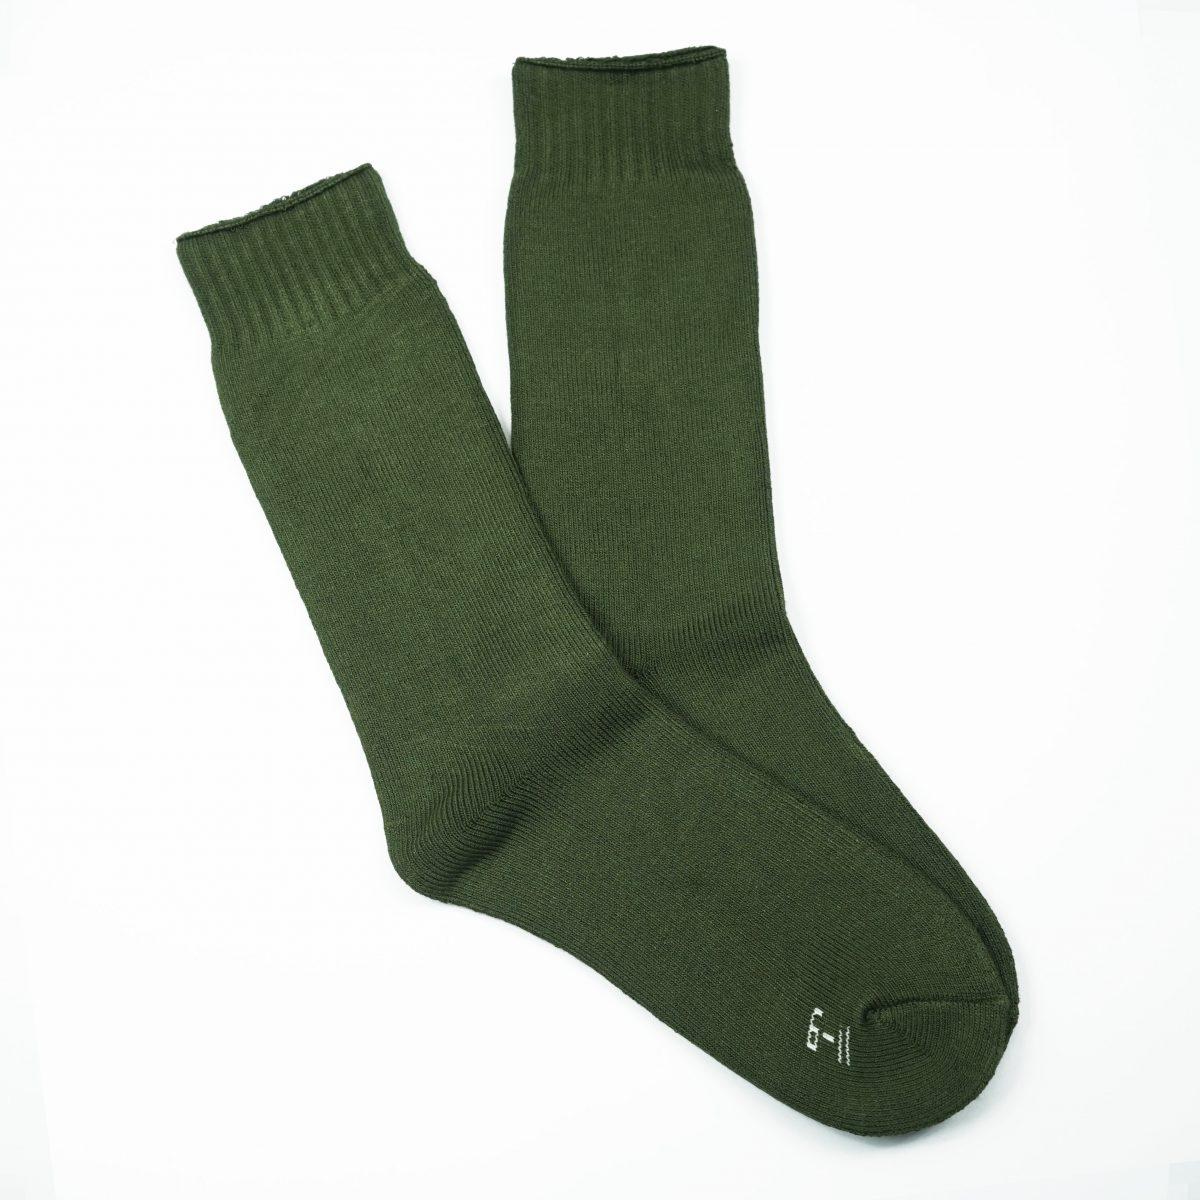 Bamboo Heavy Duty Socks - 3 Pairs Pack - Bottle Green